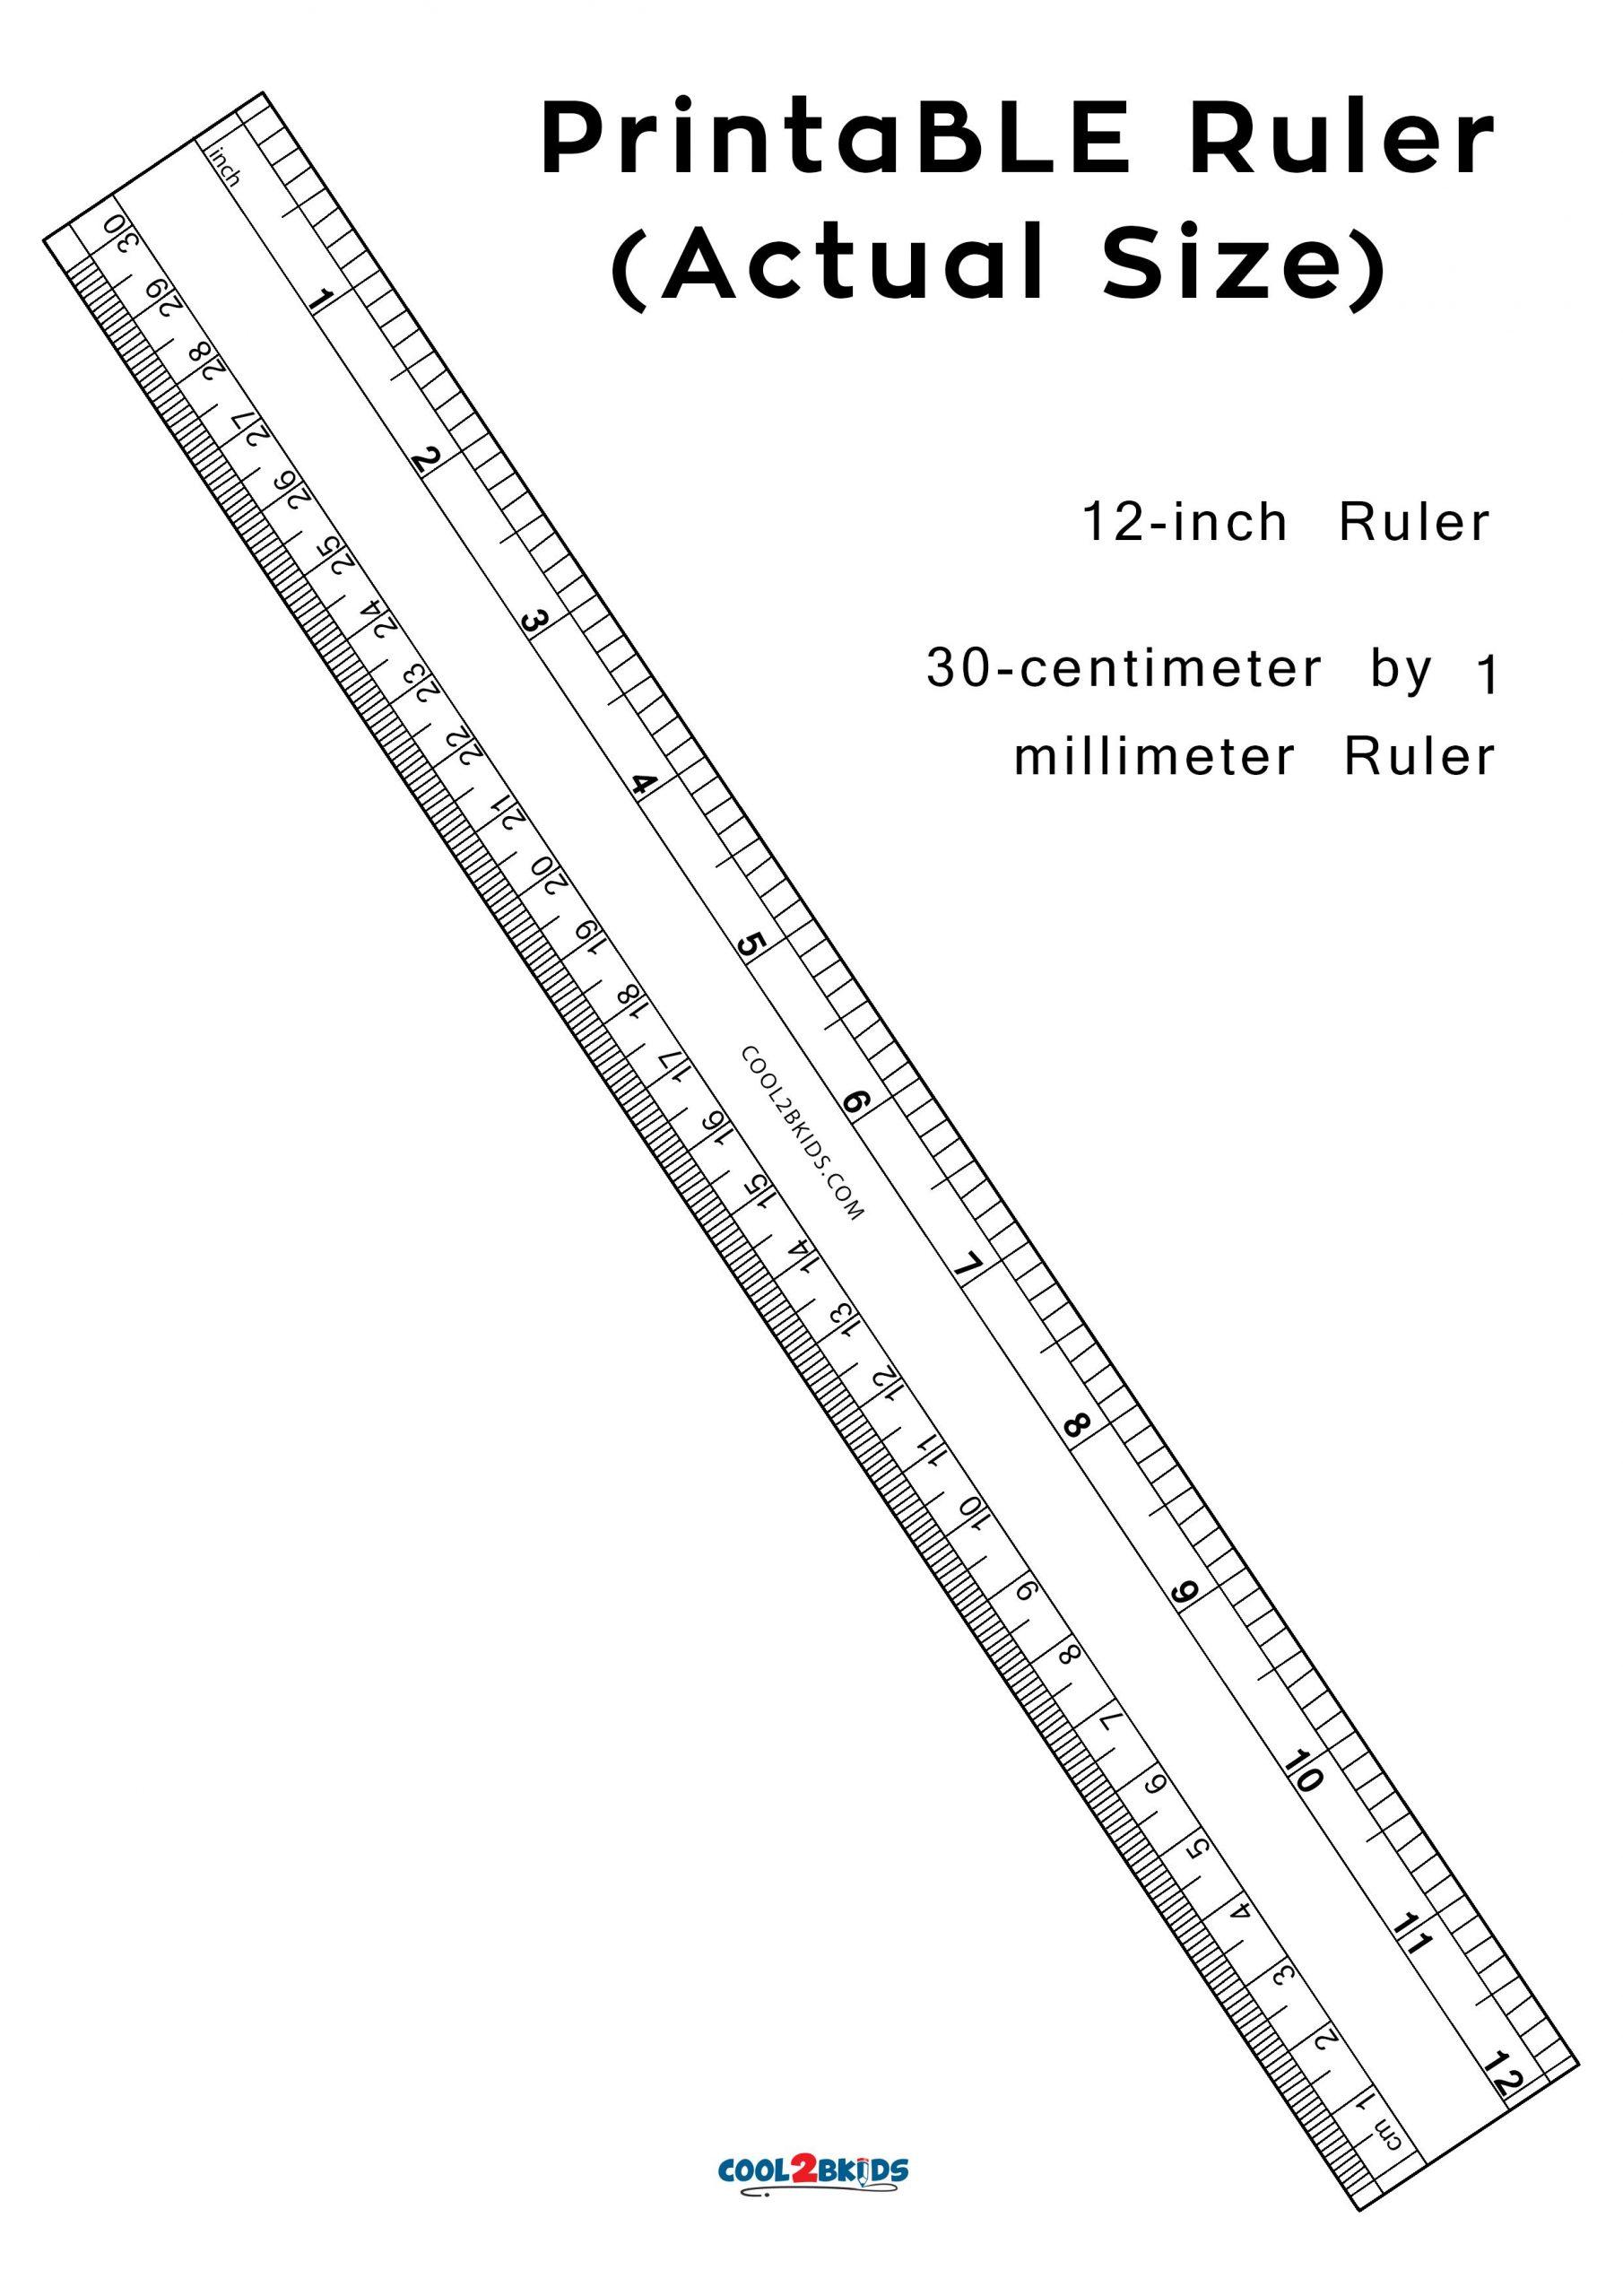 Printables | Cool2Bkids | Printable Ruler, Ruler, Millimeter